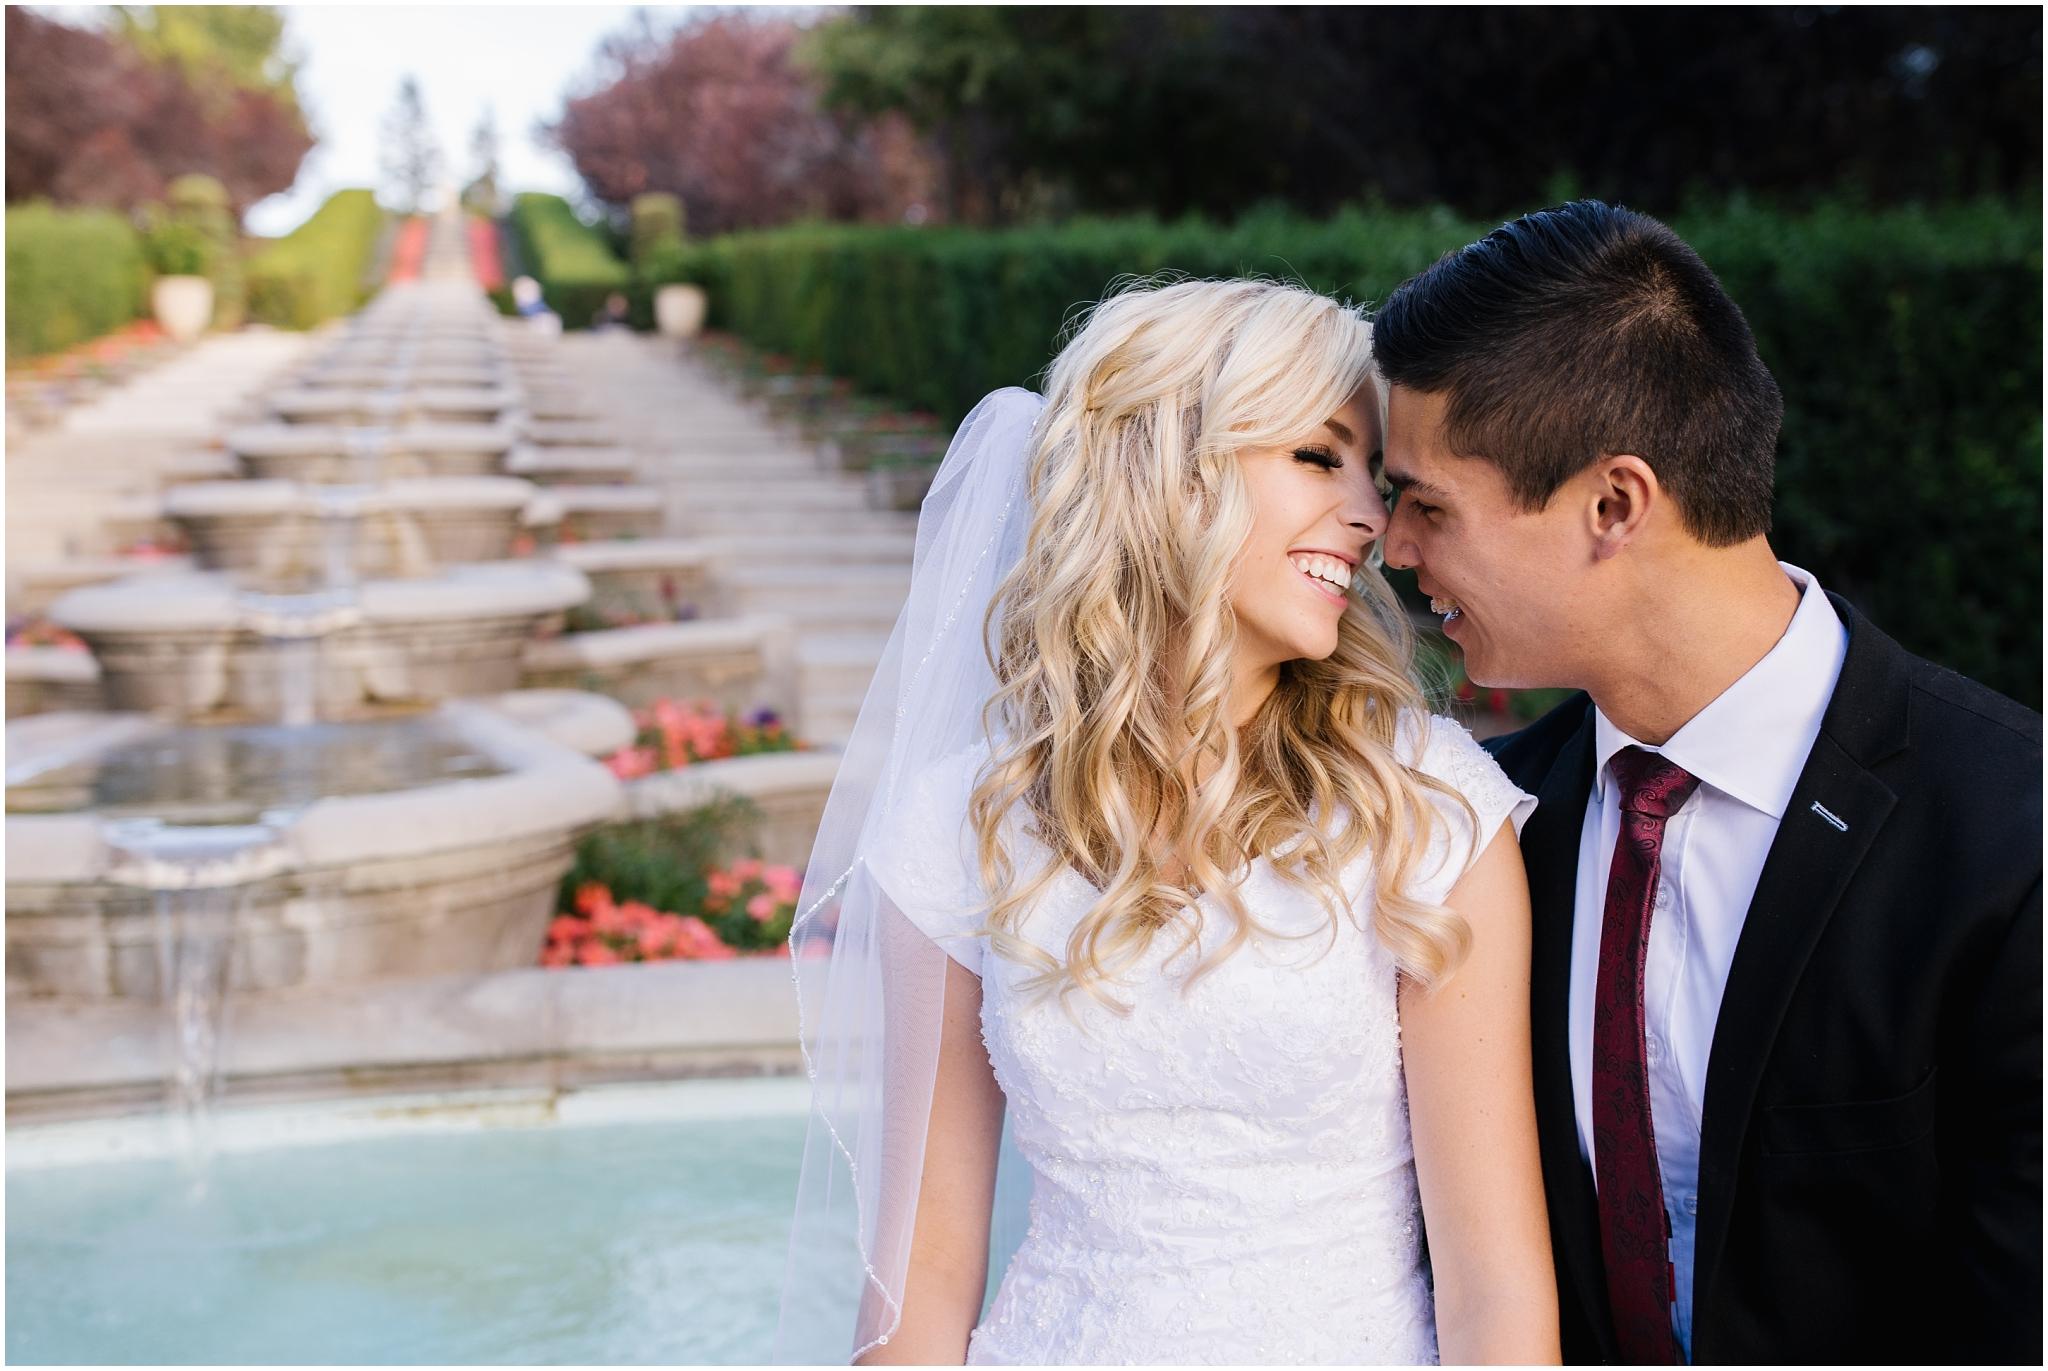 CHBridals-81_Lizzie-B-Imagery-Utah-Wedding-Photographer-Central-Utah-Park-City-Salt-Lake-City-Thanksgiving-Point-Bridals-Ashton-Gardens.jpg